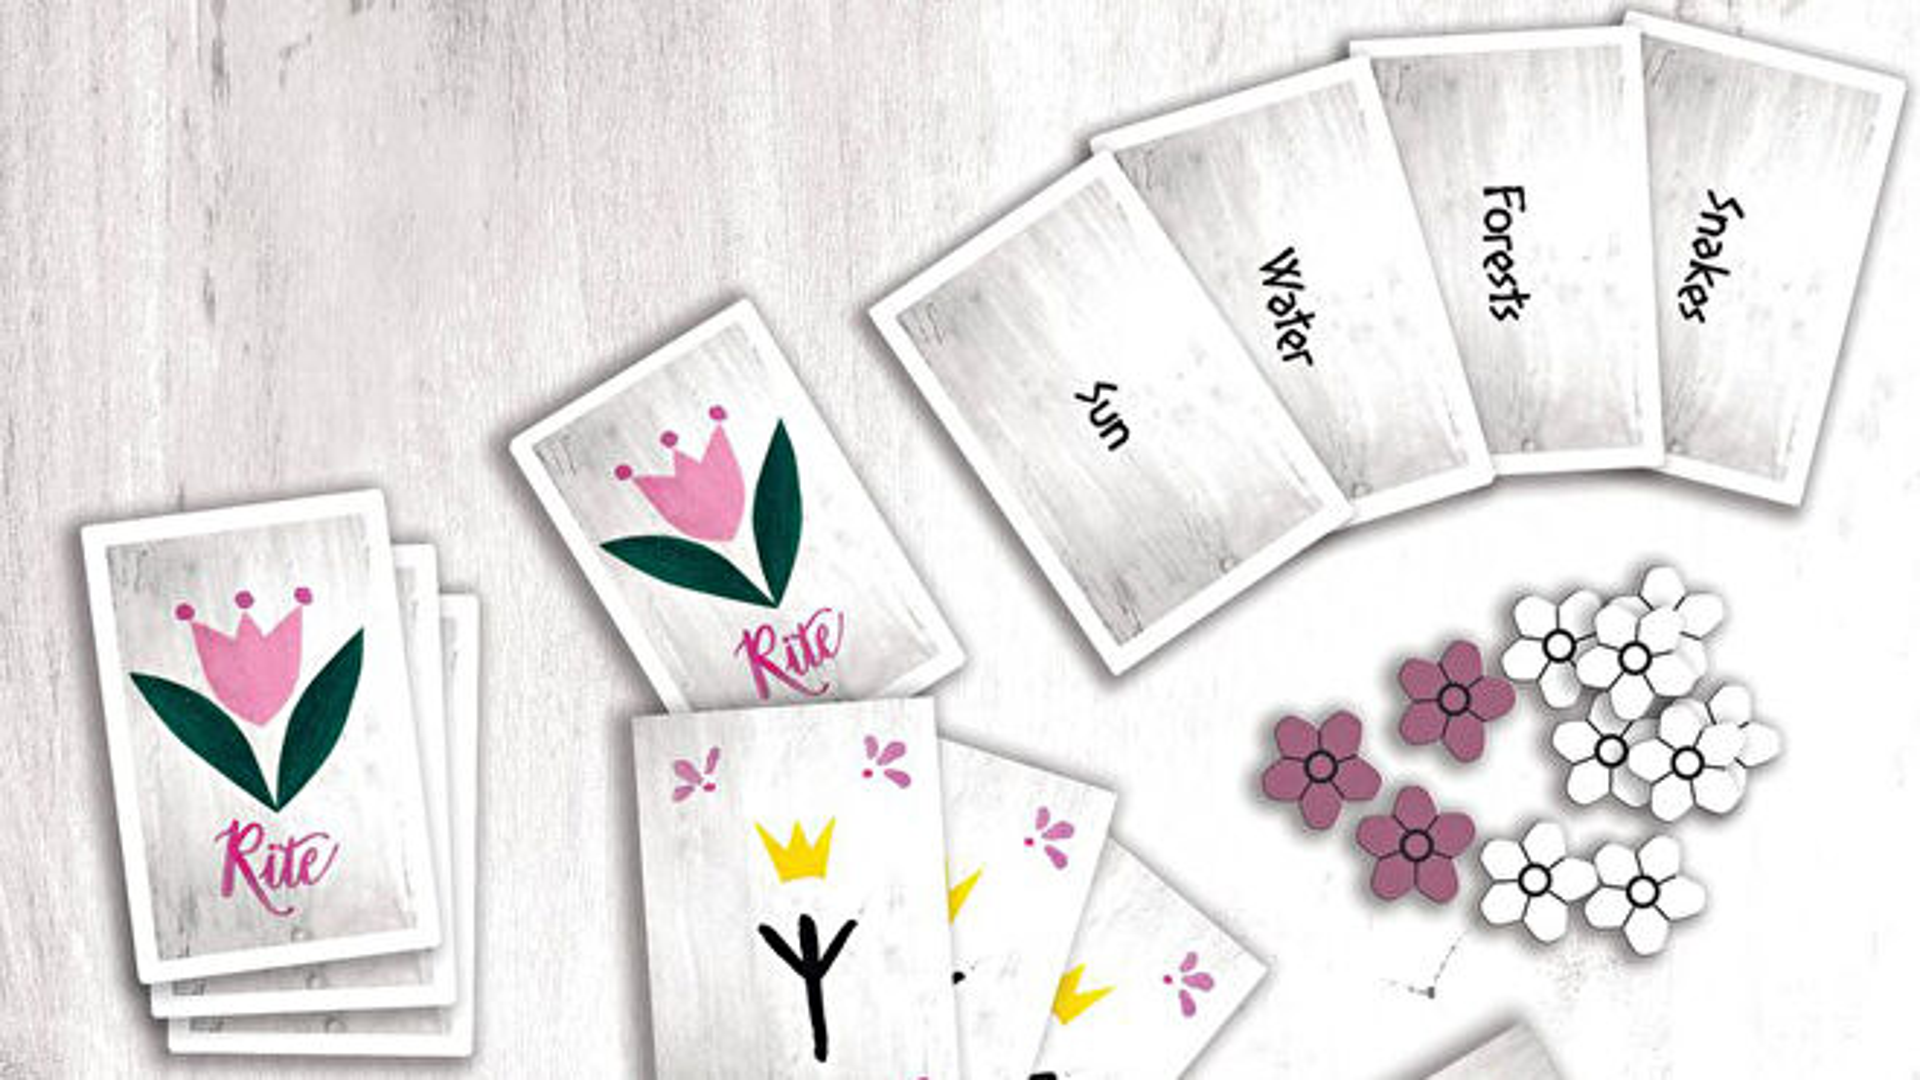 Sacred Rites Board Game Layout 2